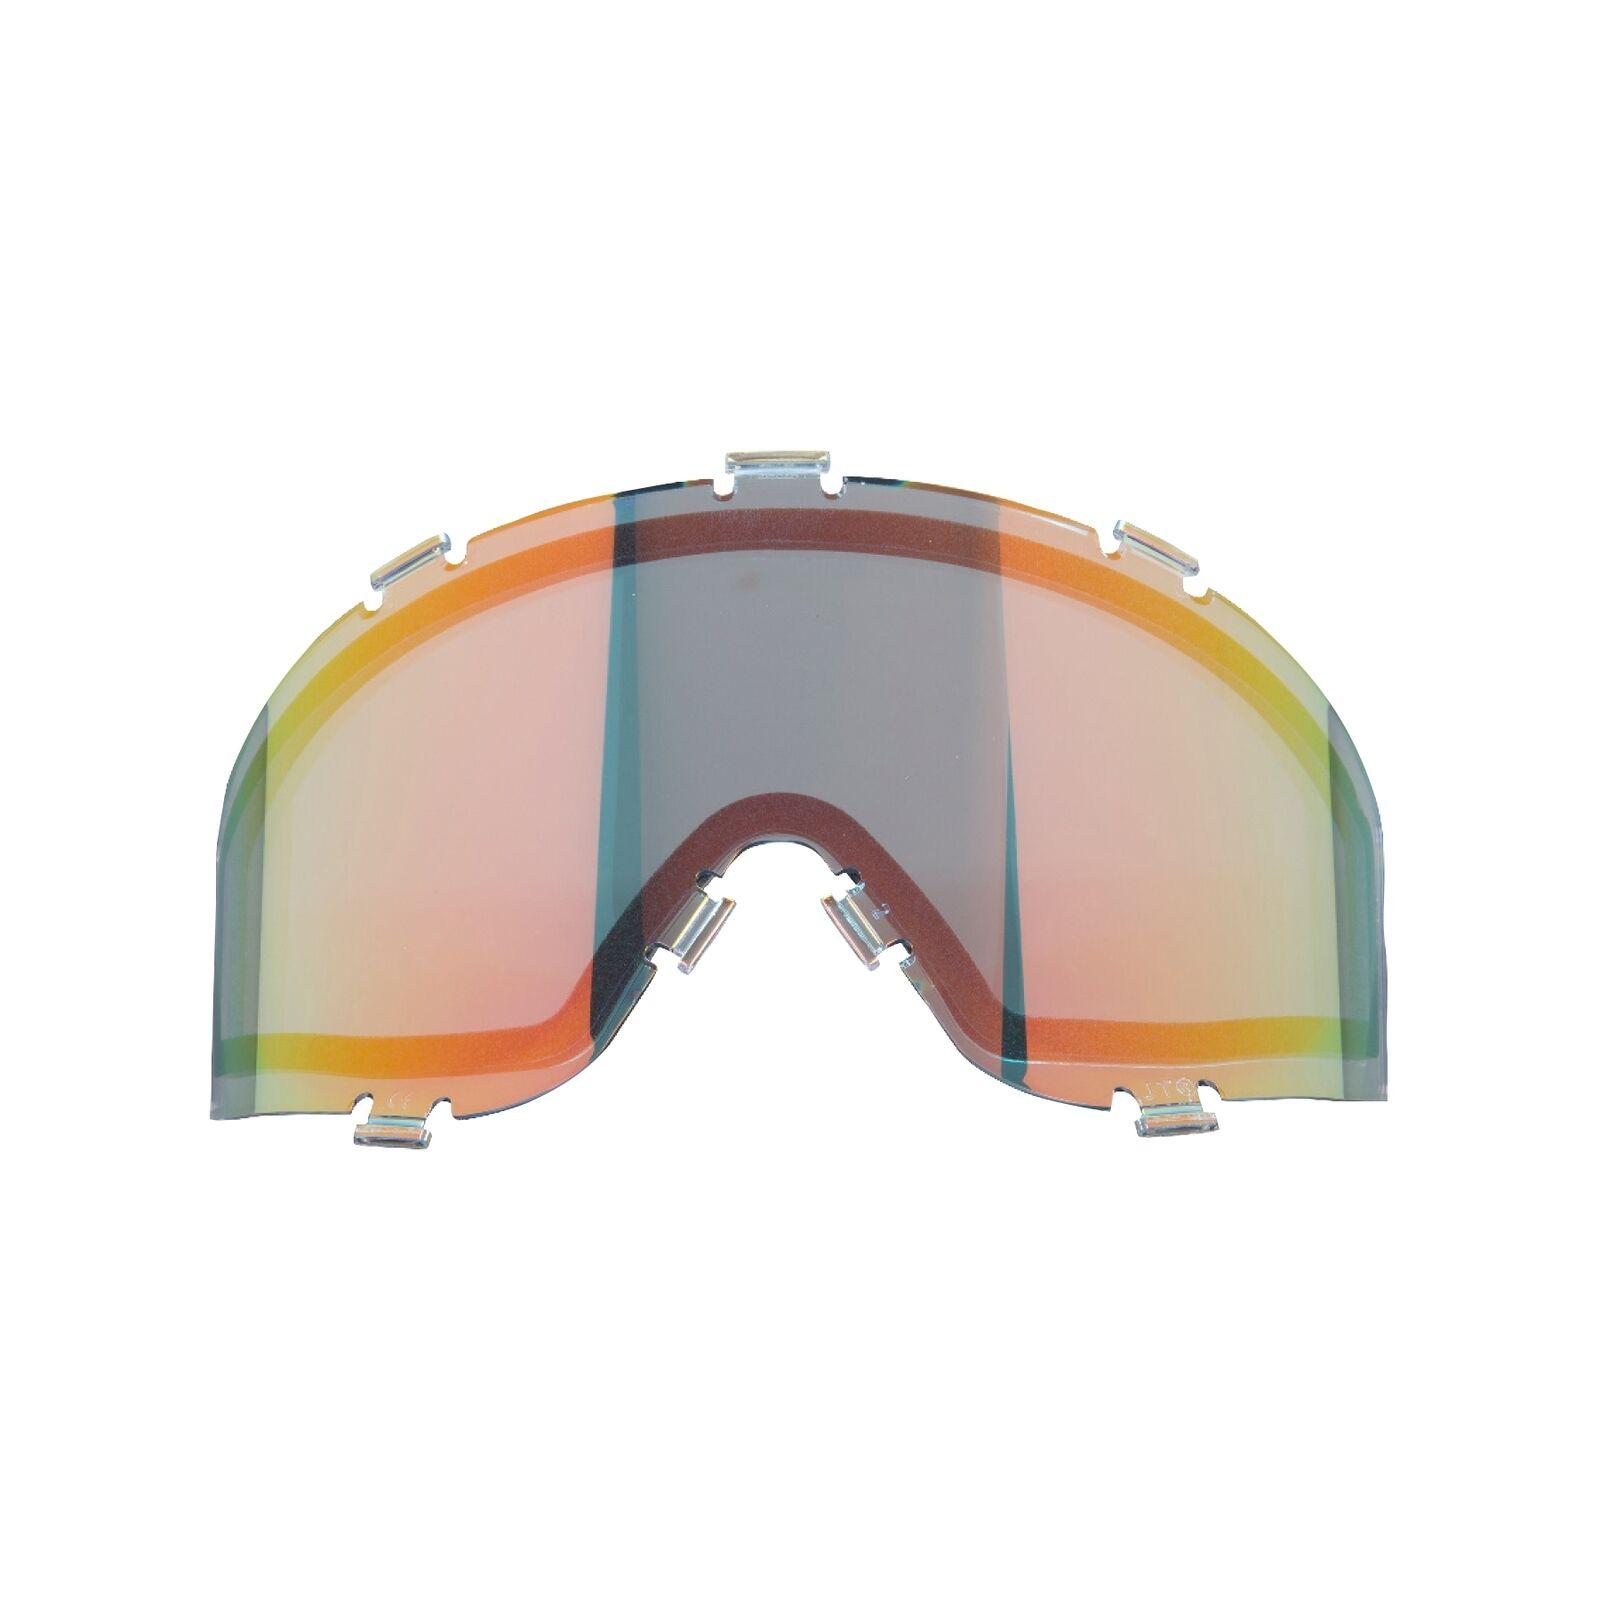 JT Spectra Goggle Thermal Lens - Prizm 2.0 HI-Def